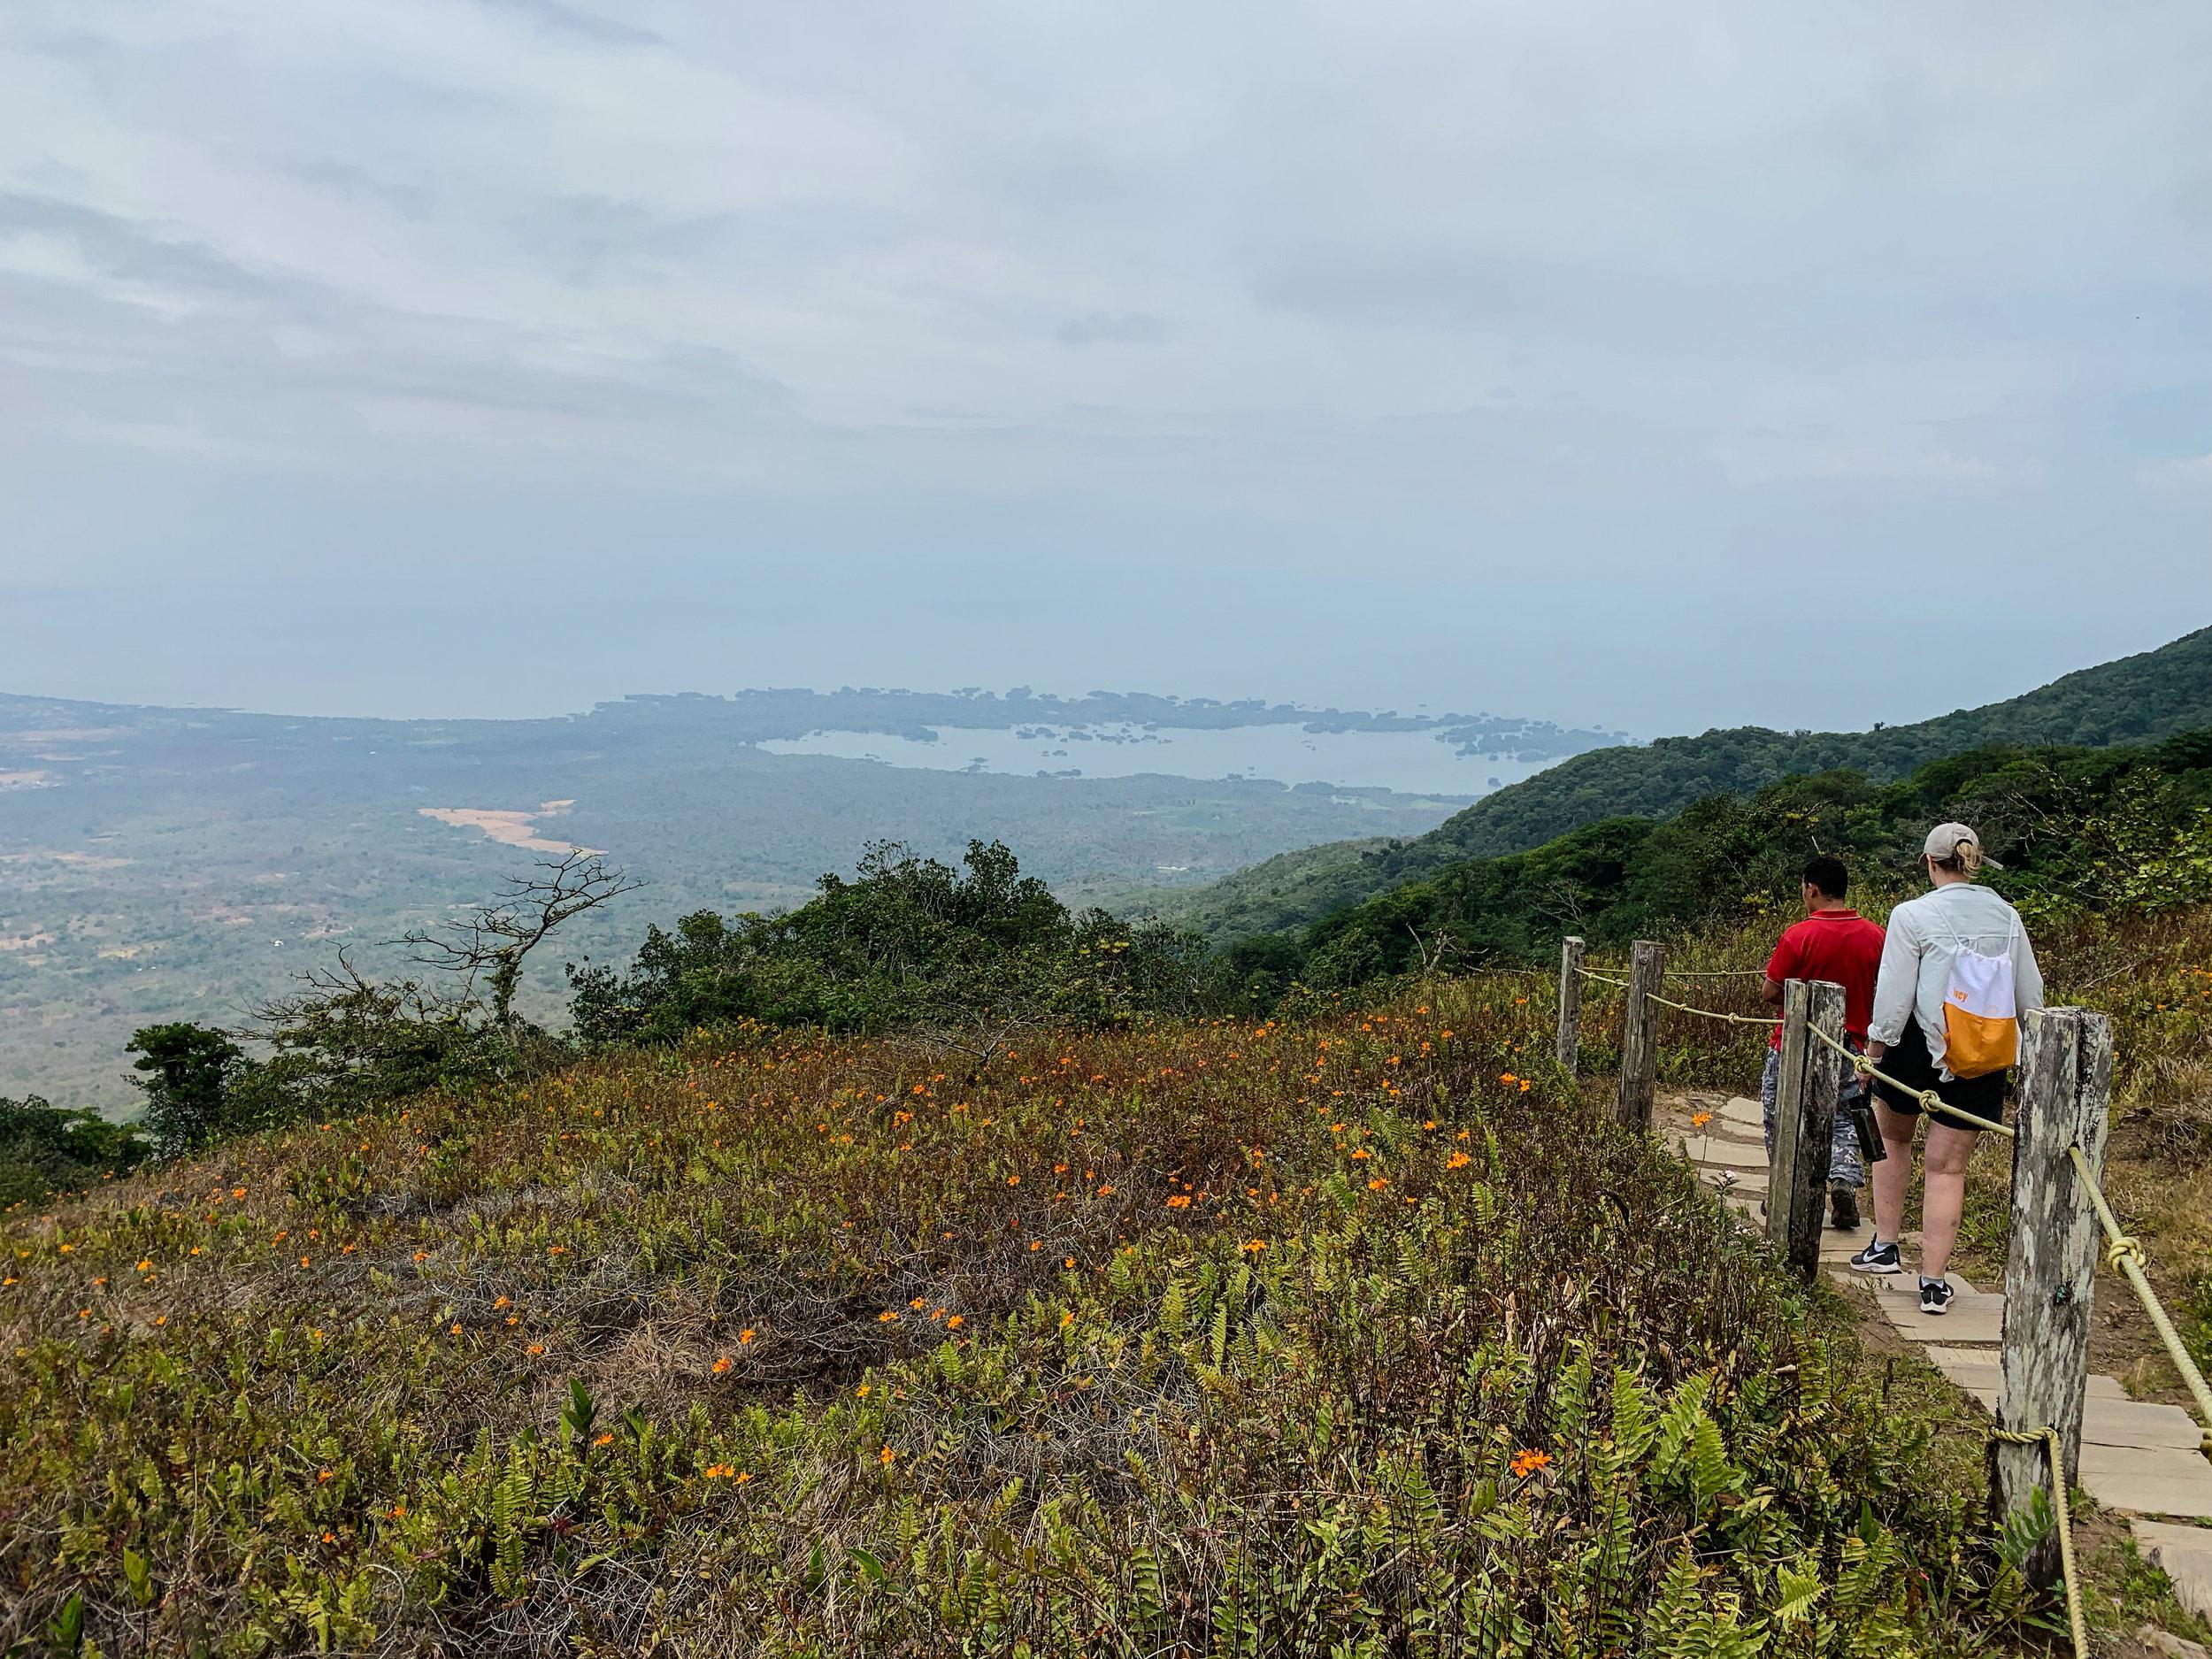 Hiking on Mombacho Volcano, overlooking the Isletas de Granada and Lake Nicaragua.